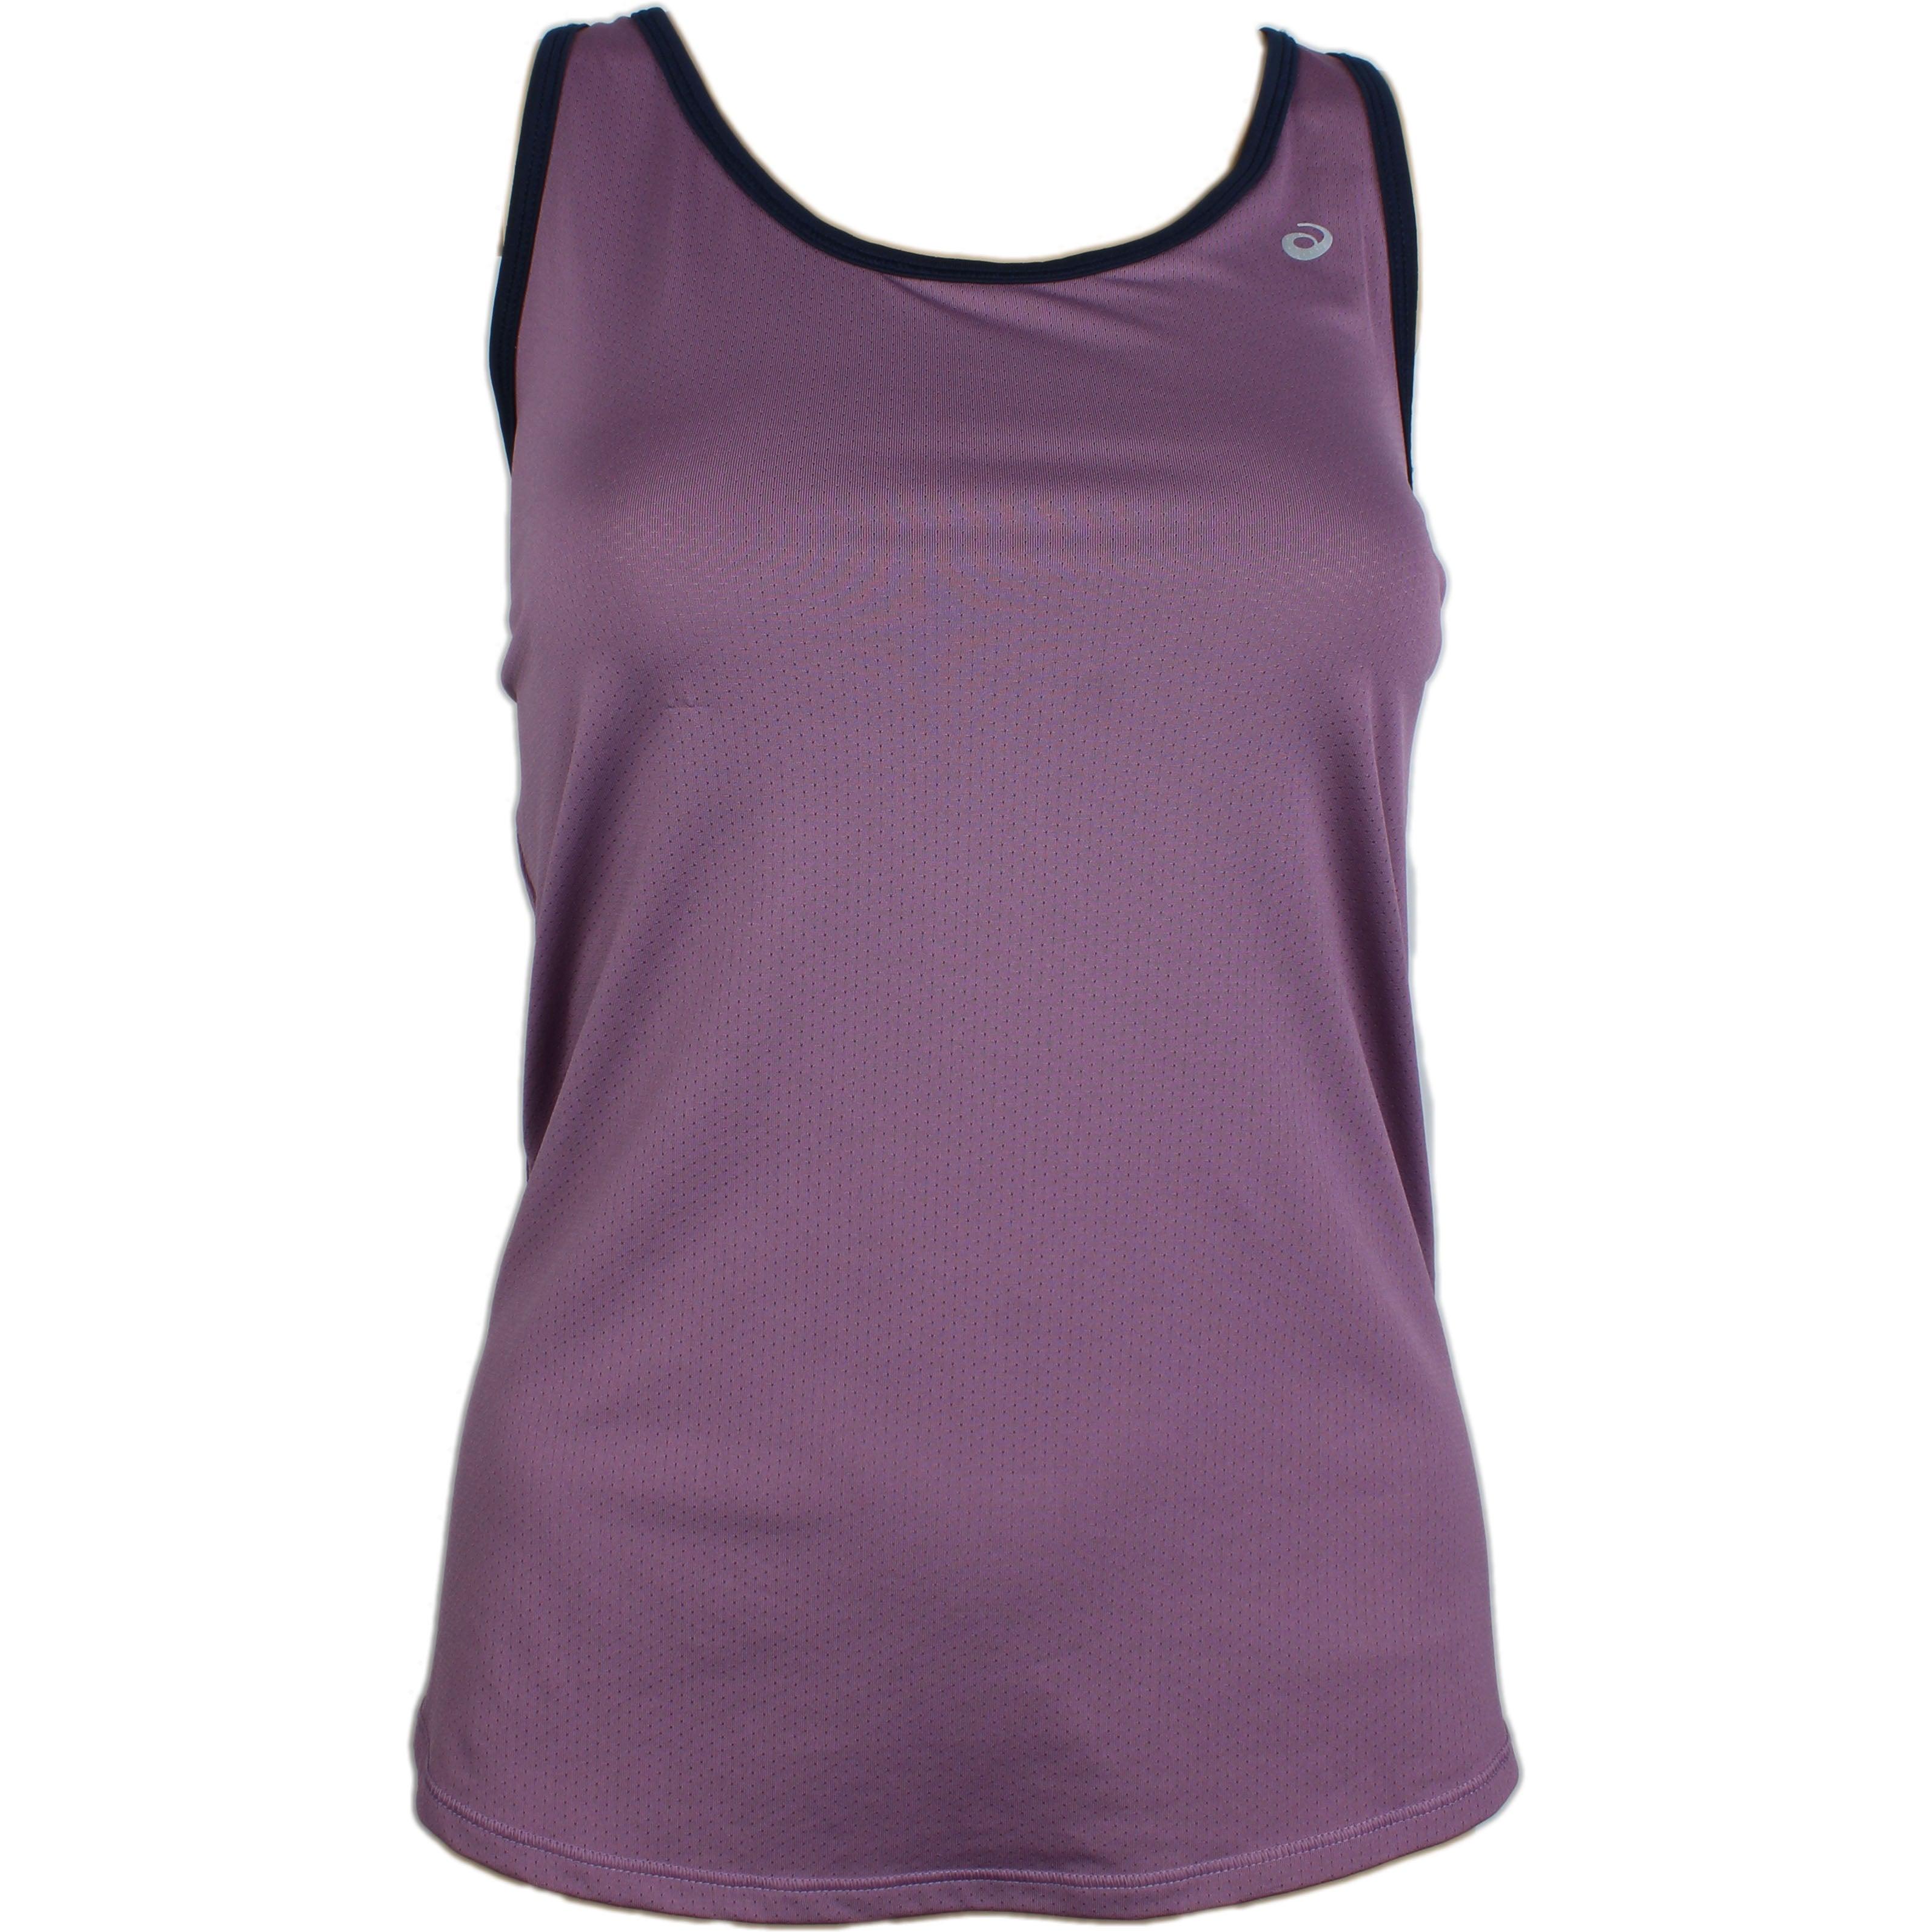 5802b5eabc8b Details about ASICS Emma Racerback - Purple - Womens